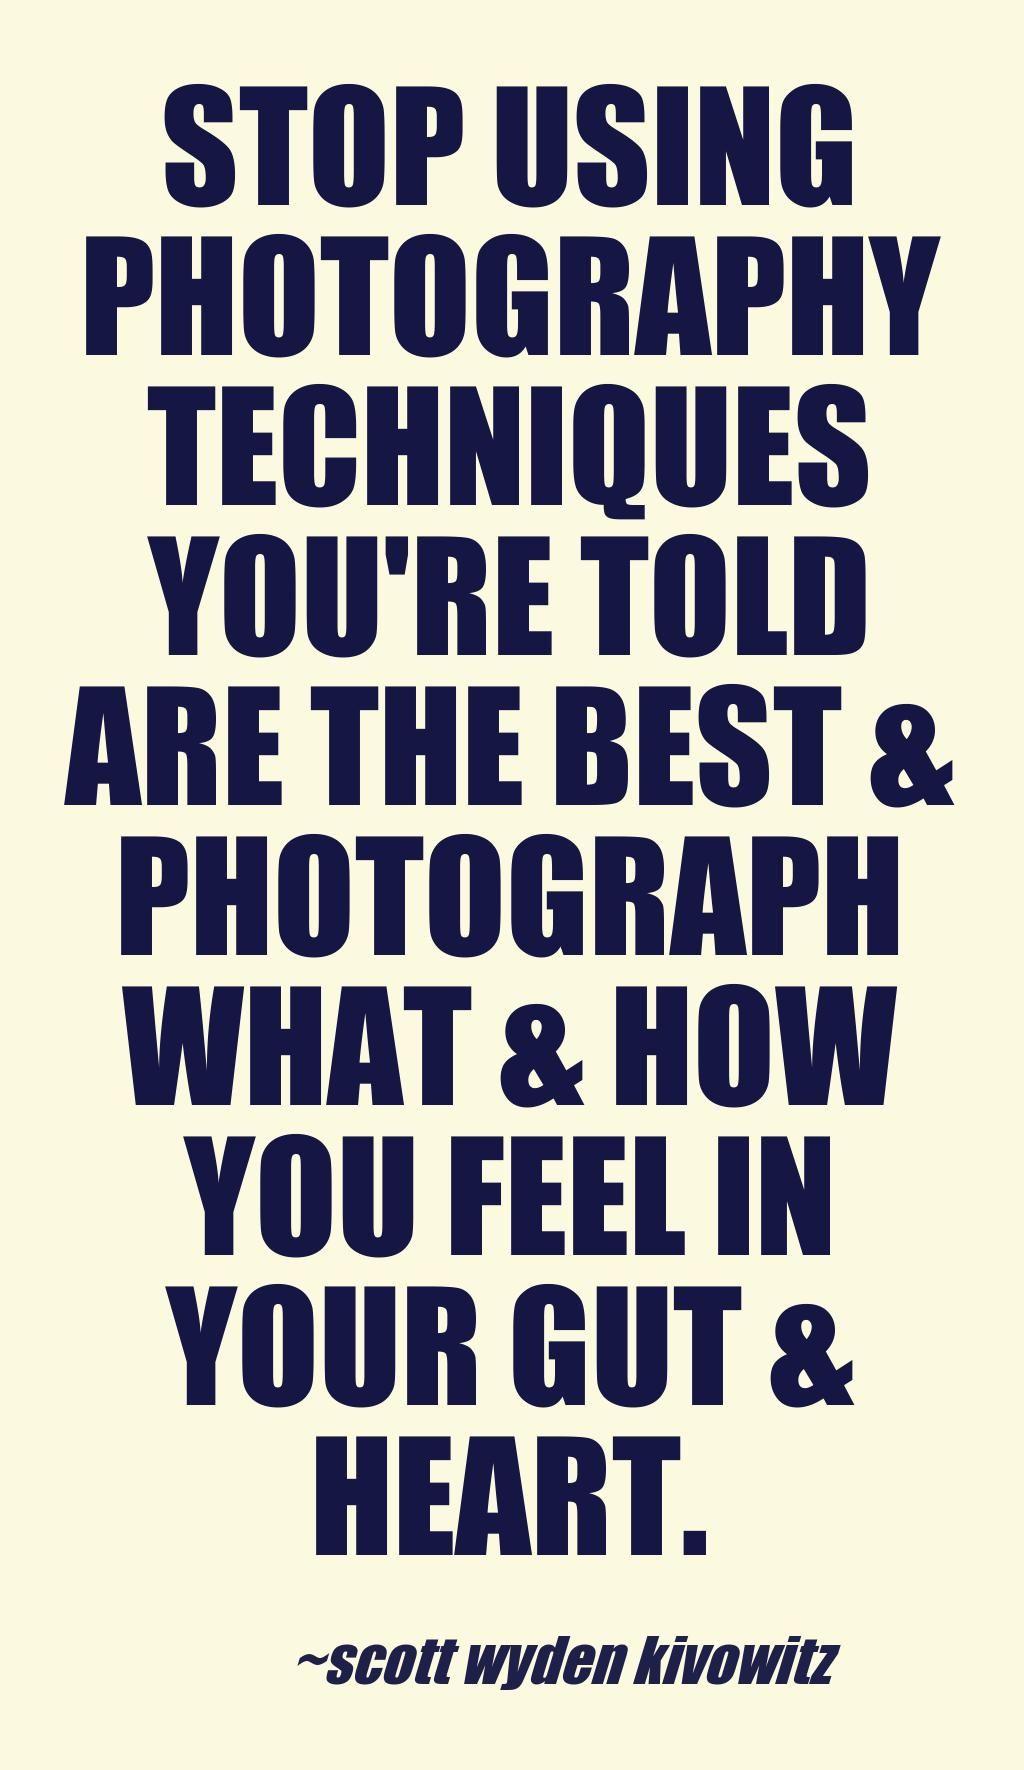 Scott Wyden Kivowitz New Jersey Photographer Quotes About Photography Photographer Quotes Funny Photography